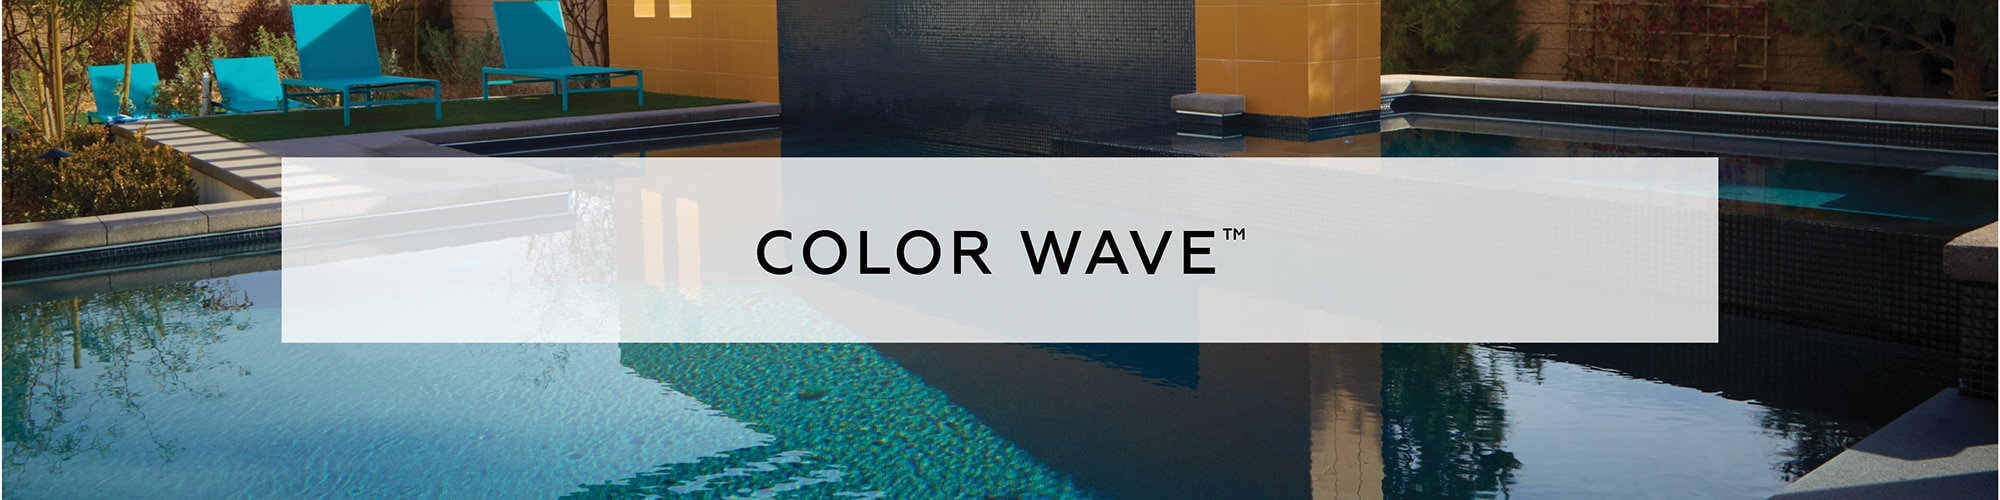 DAL_Aug2020_ColorWave_41_banner